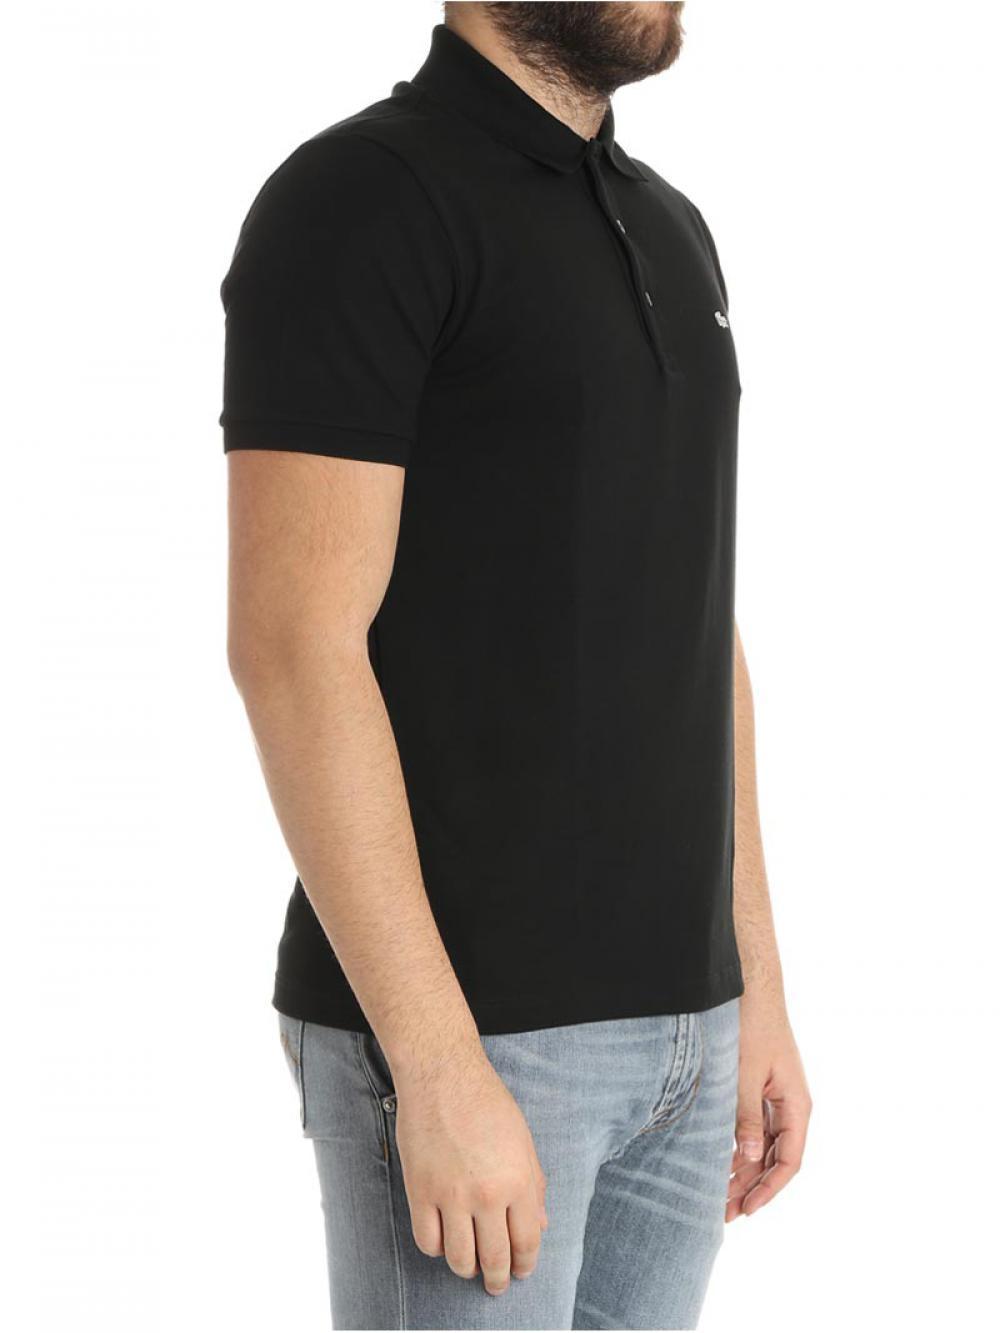 polo-shirt-lacoste-cod-ph4014